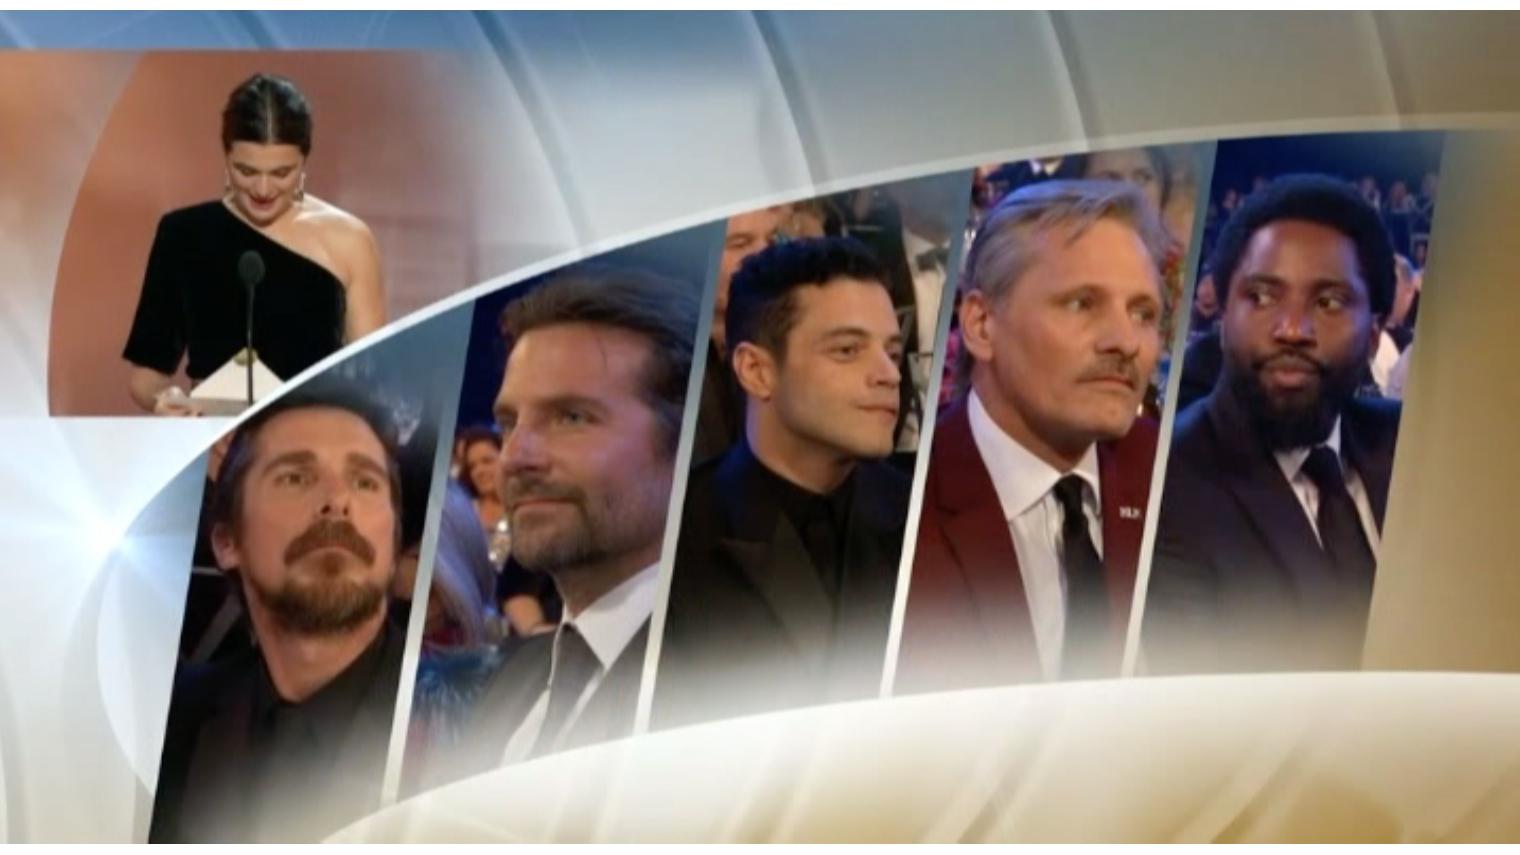 SAG_Awards_Show_0_20190128230205